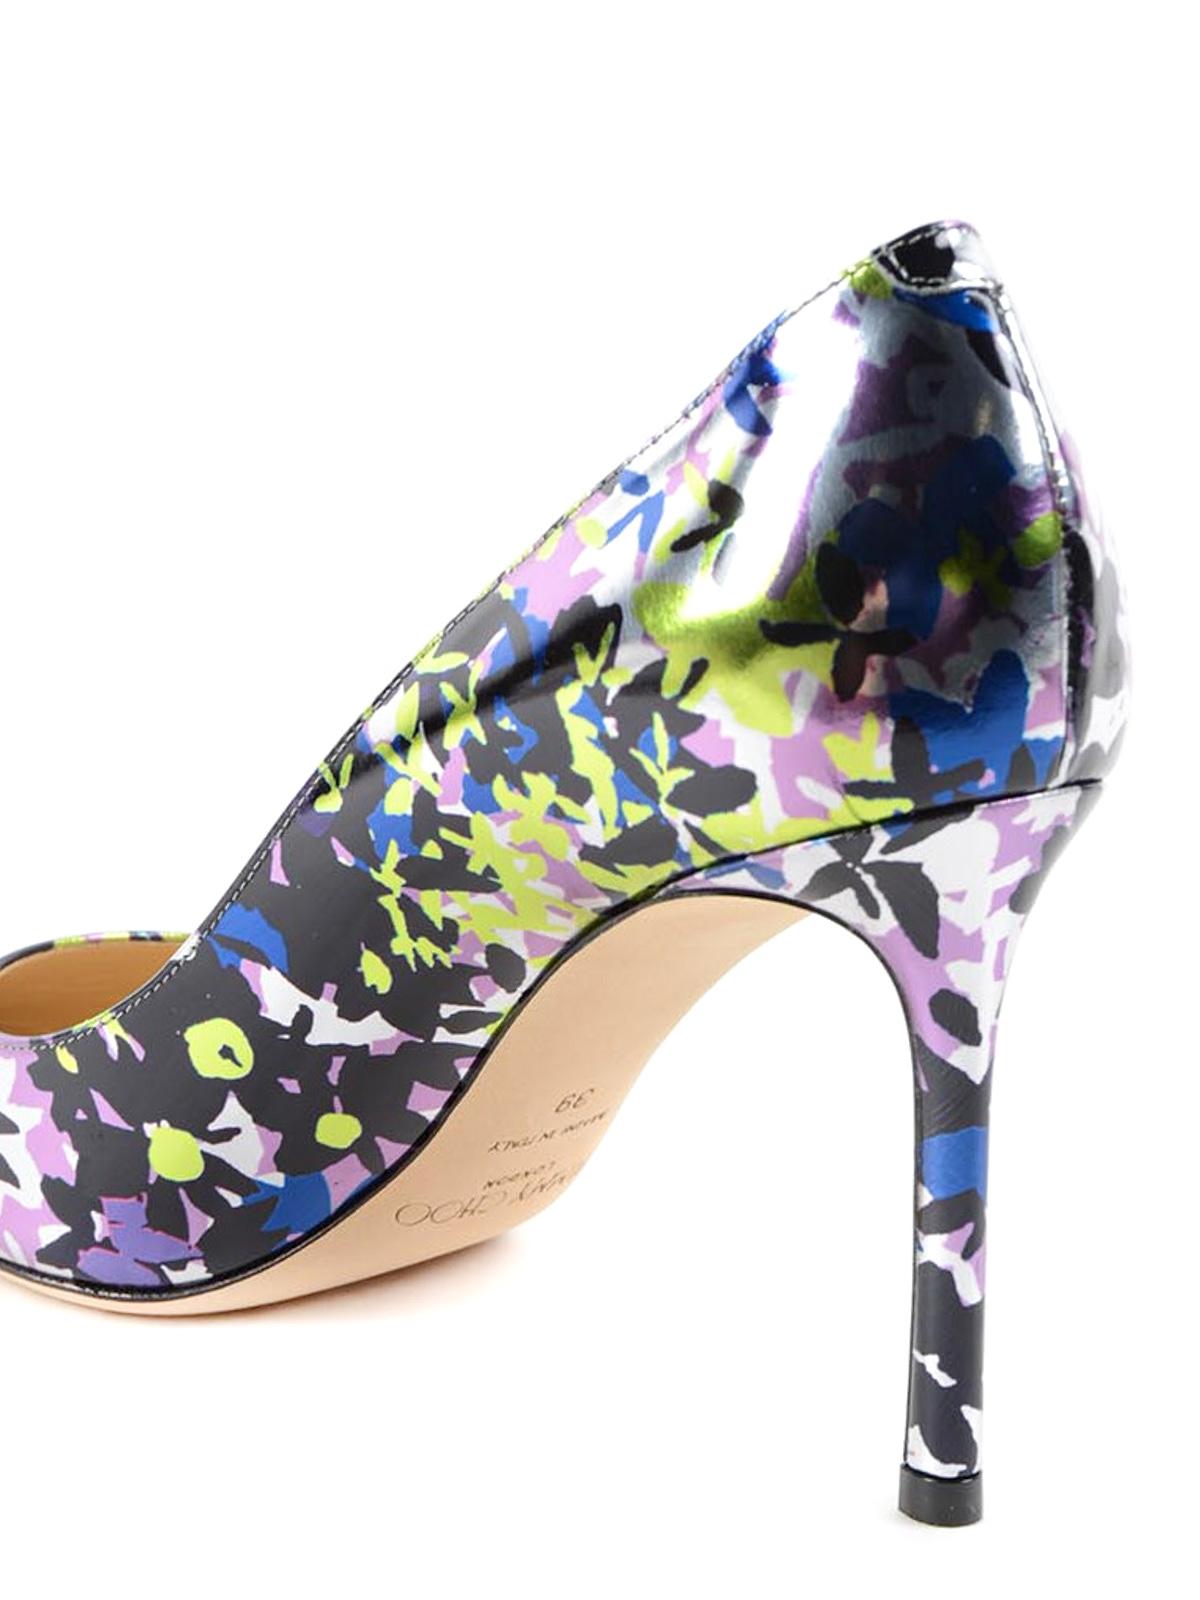 Salón Jimmy Zapato Verde 85 Choo De Zapatos Xcp Romy xoWCBQrde